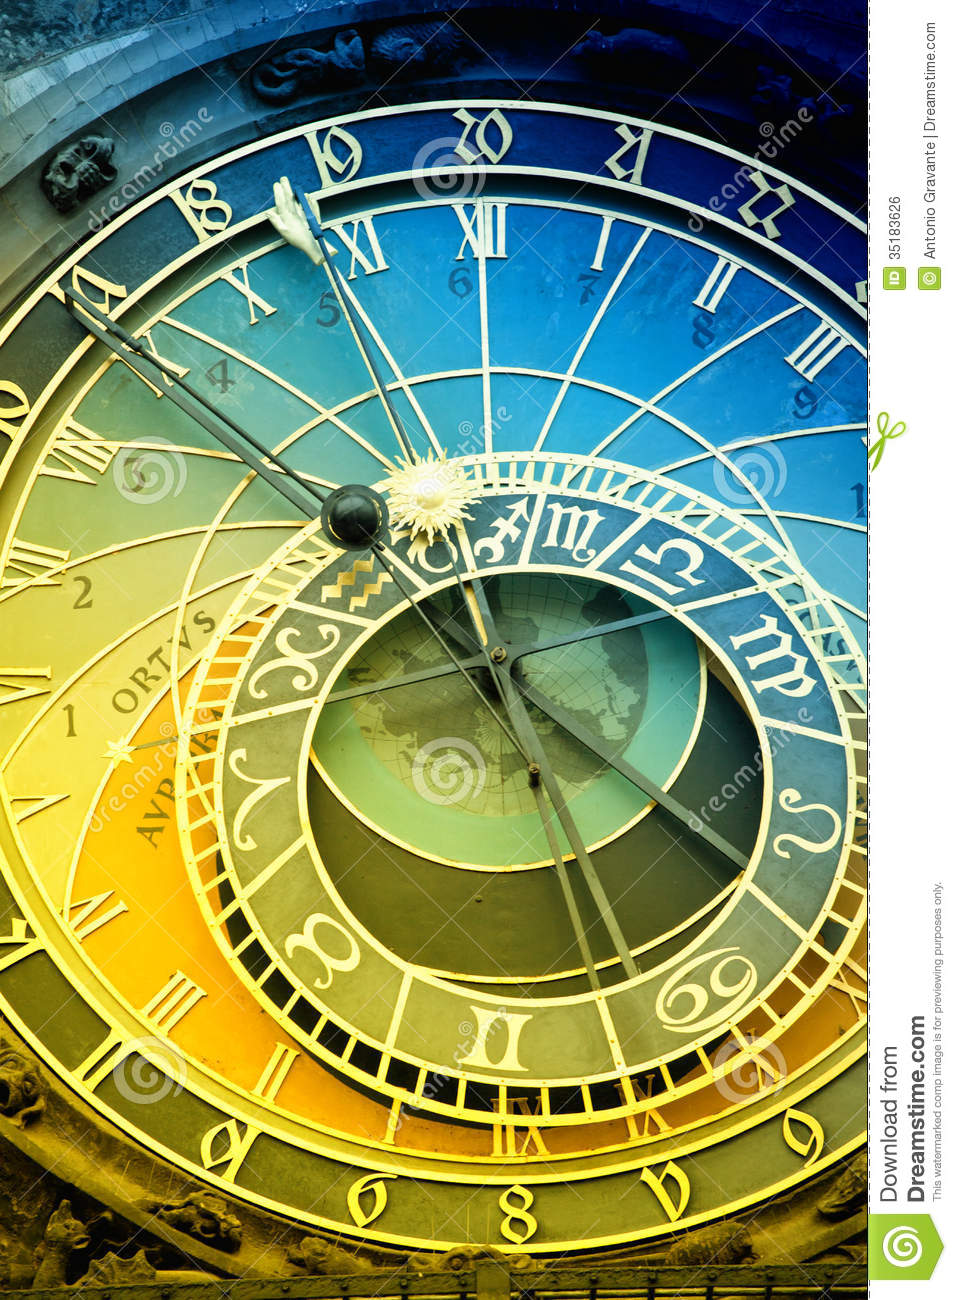 Orloj Astronomical Clock In Prague In Czech Republic Royalty Free.